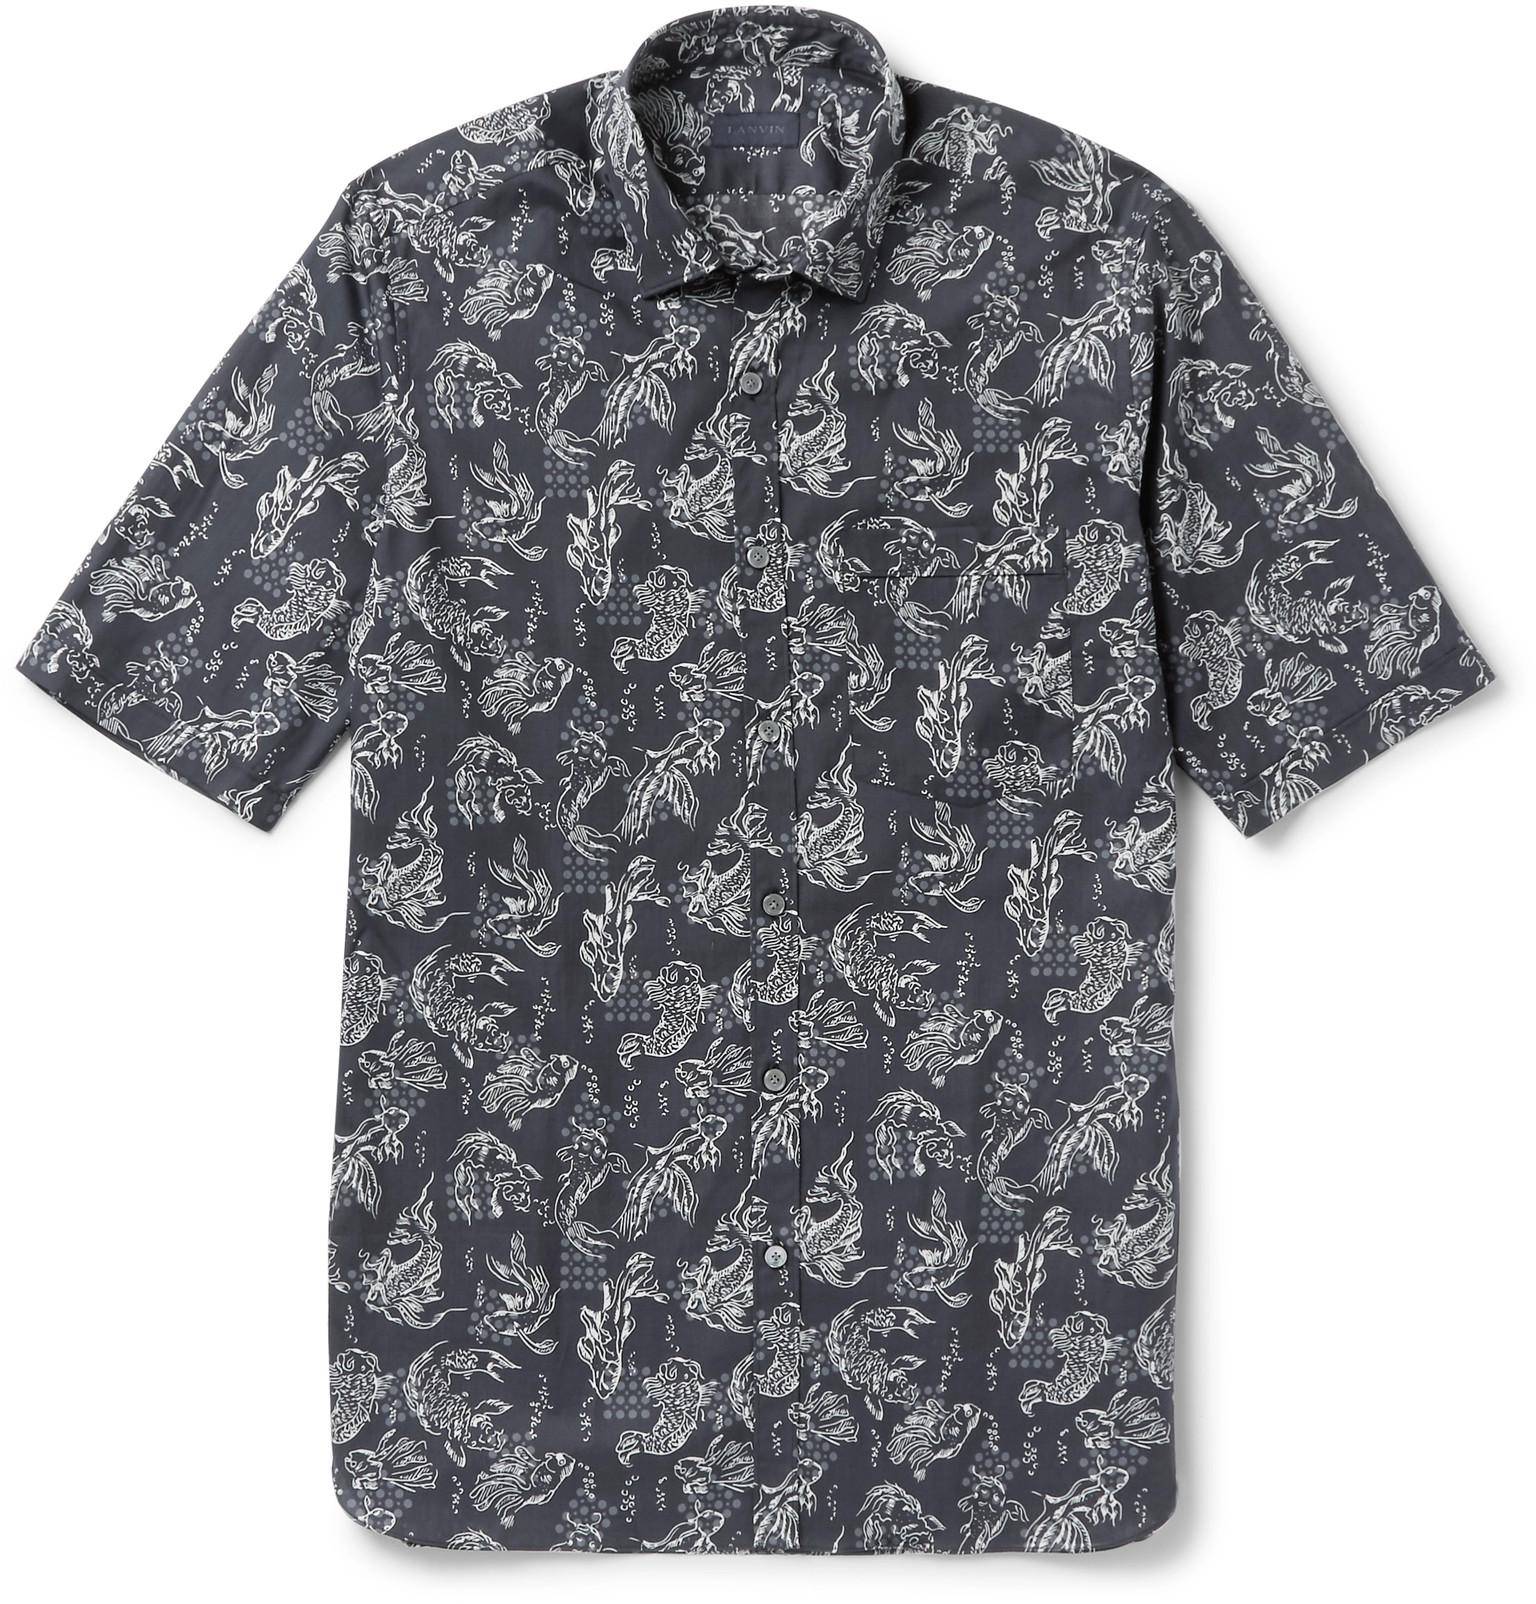 Polo shirt design editor - Click To Close